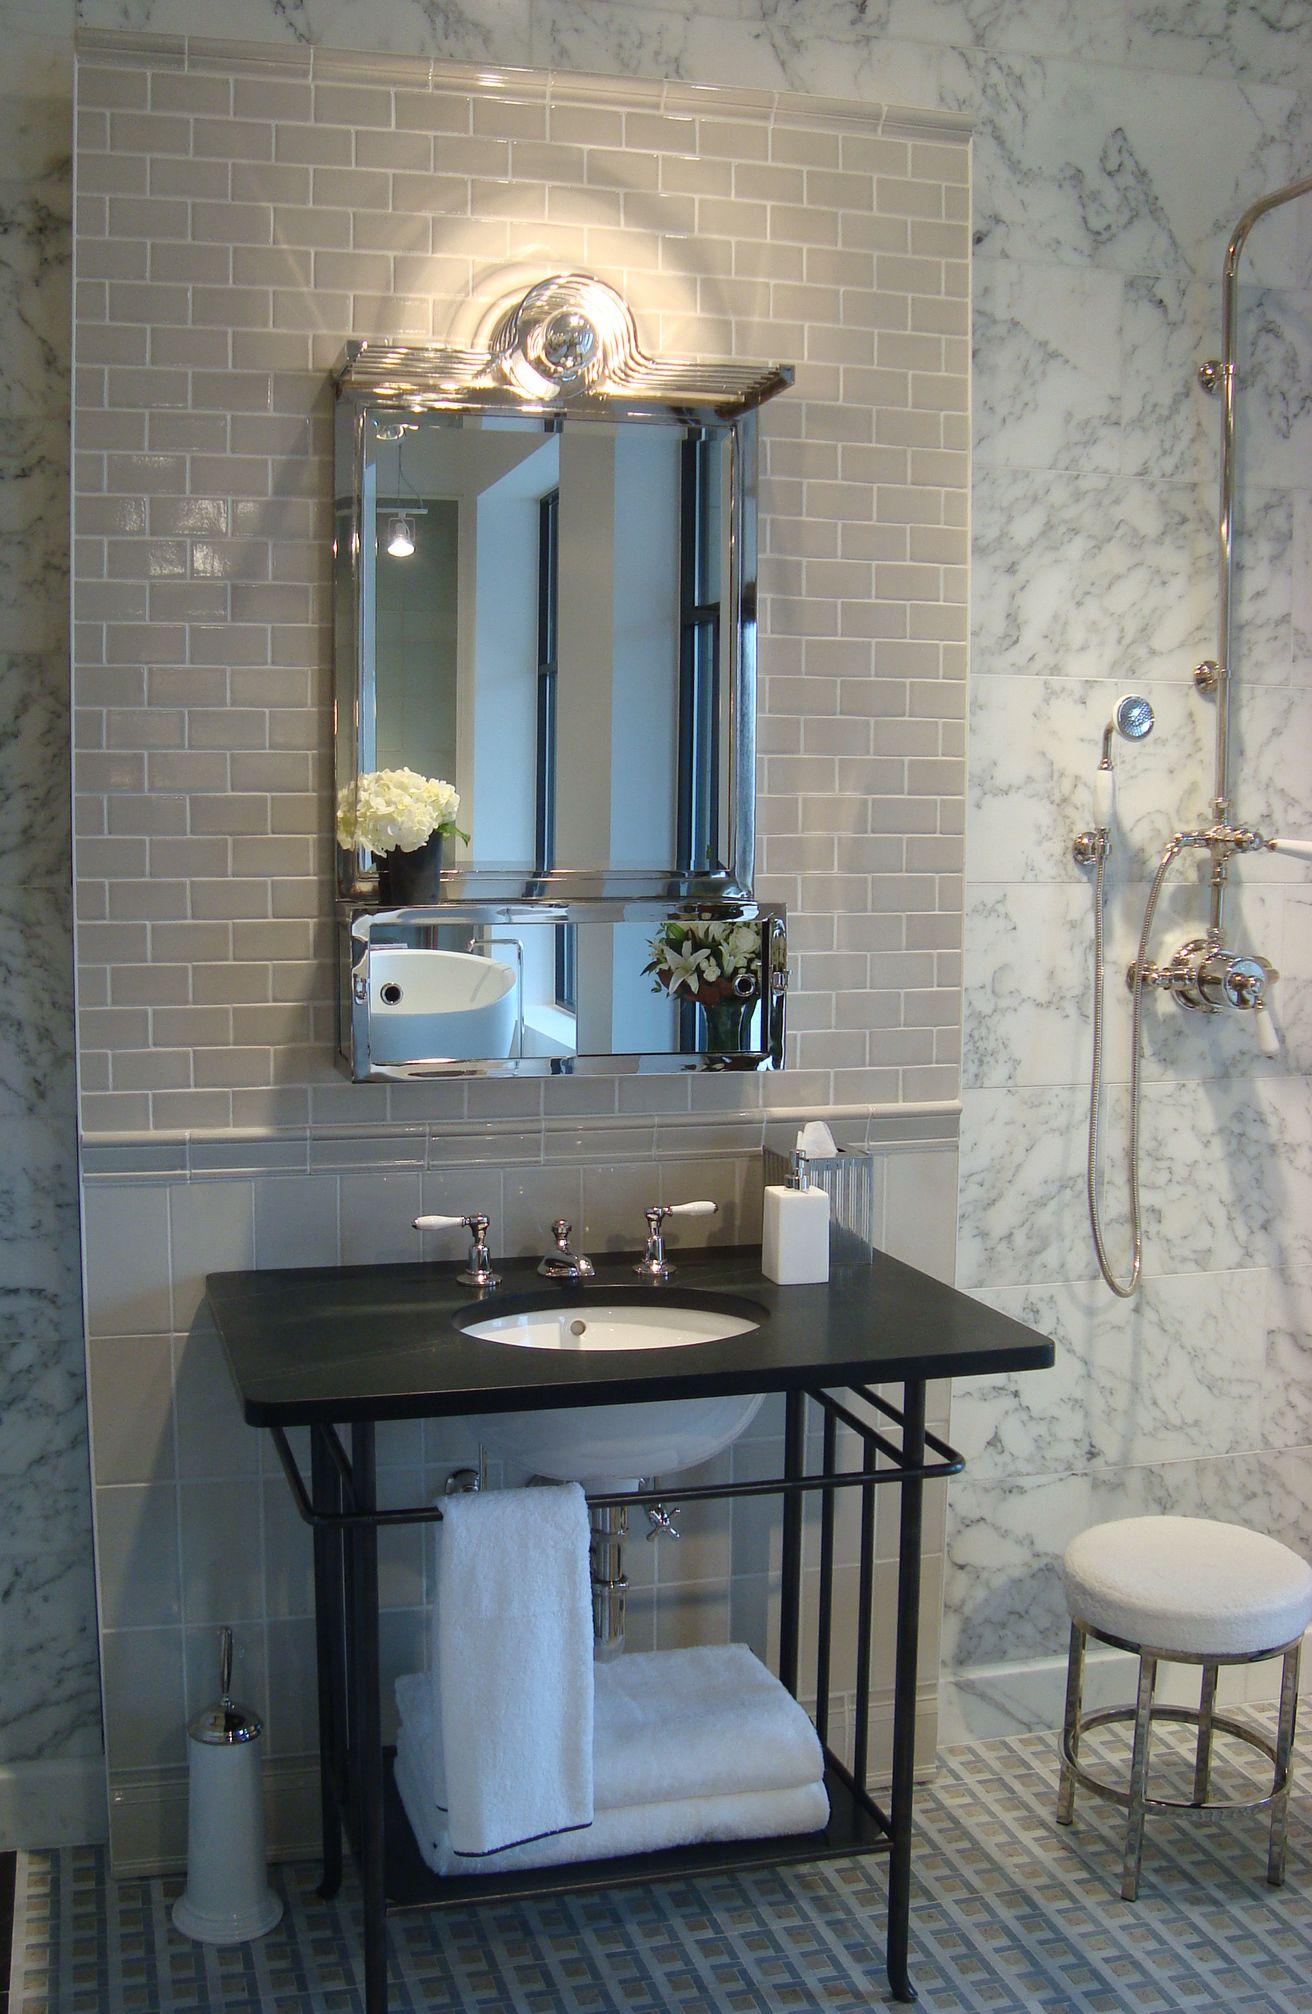 Bathroom Design Denver Simple Bathroom Display In The Denver Showroom  Denver Showroom Review